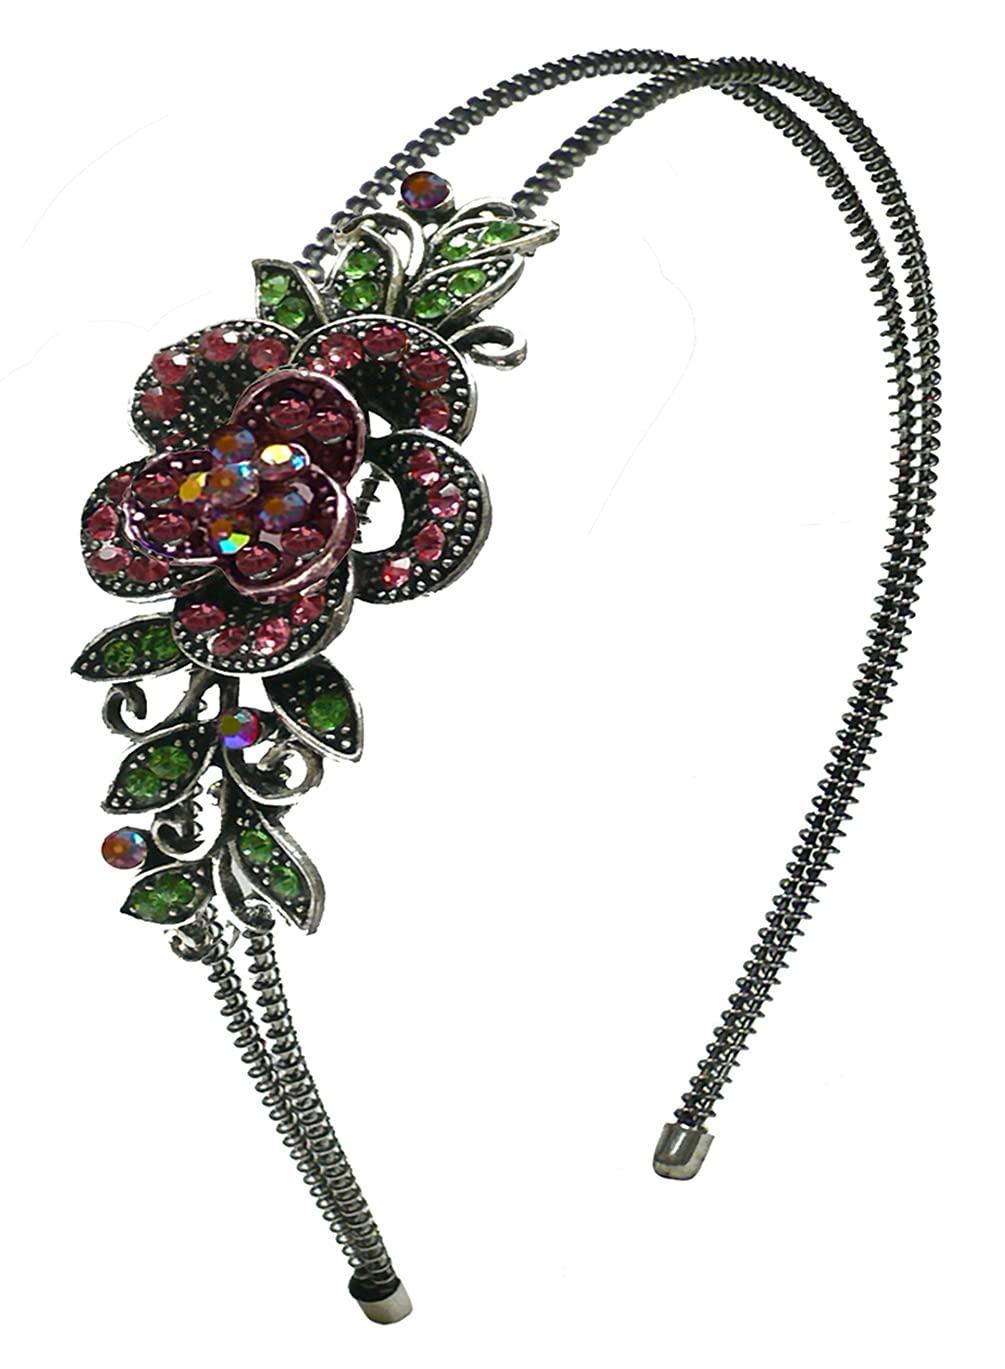 Crystal Flower Headband Resilient Metal Wire Hairband YY86121-0119roseRoseAB